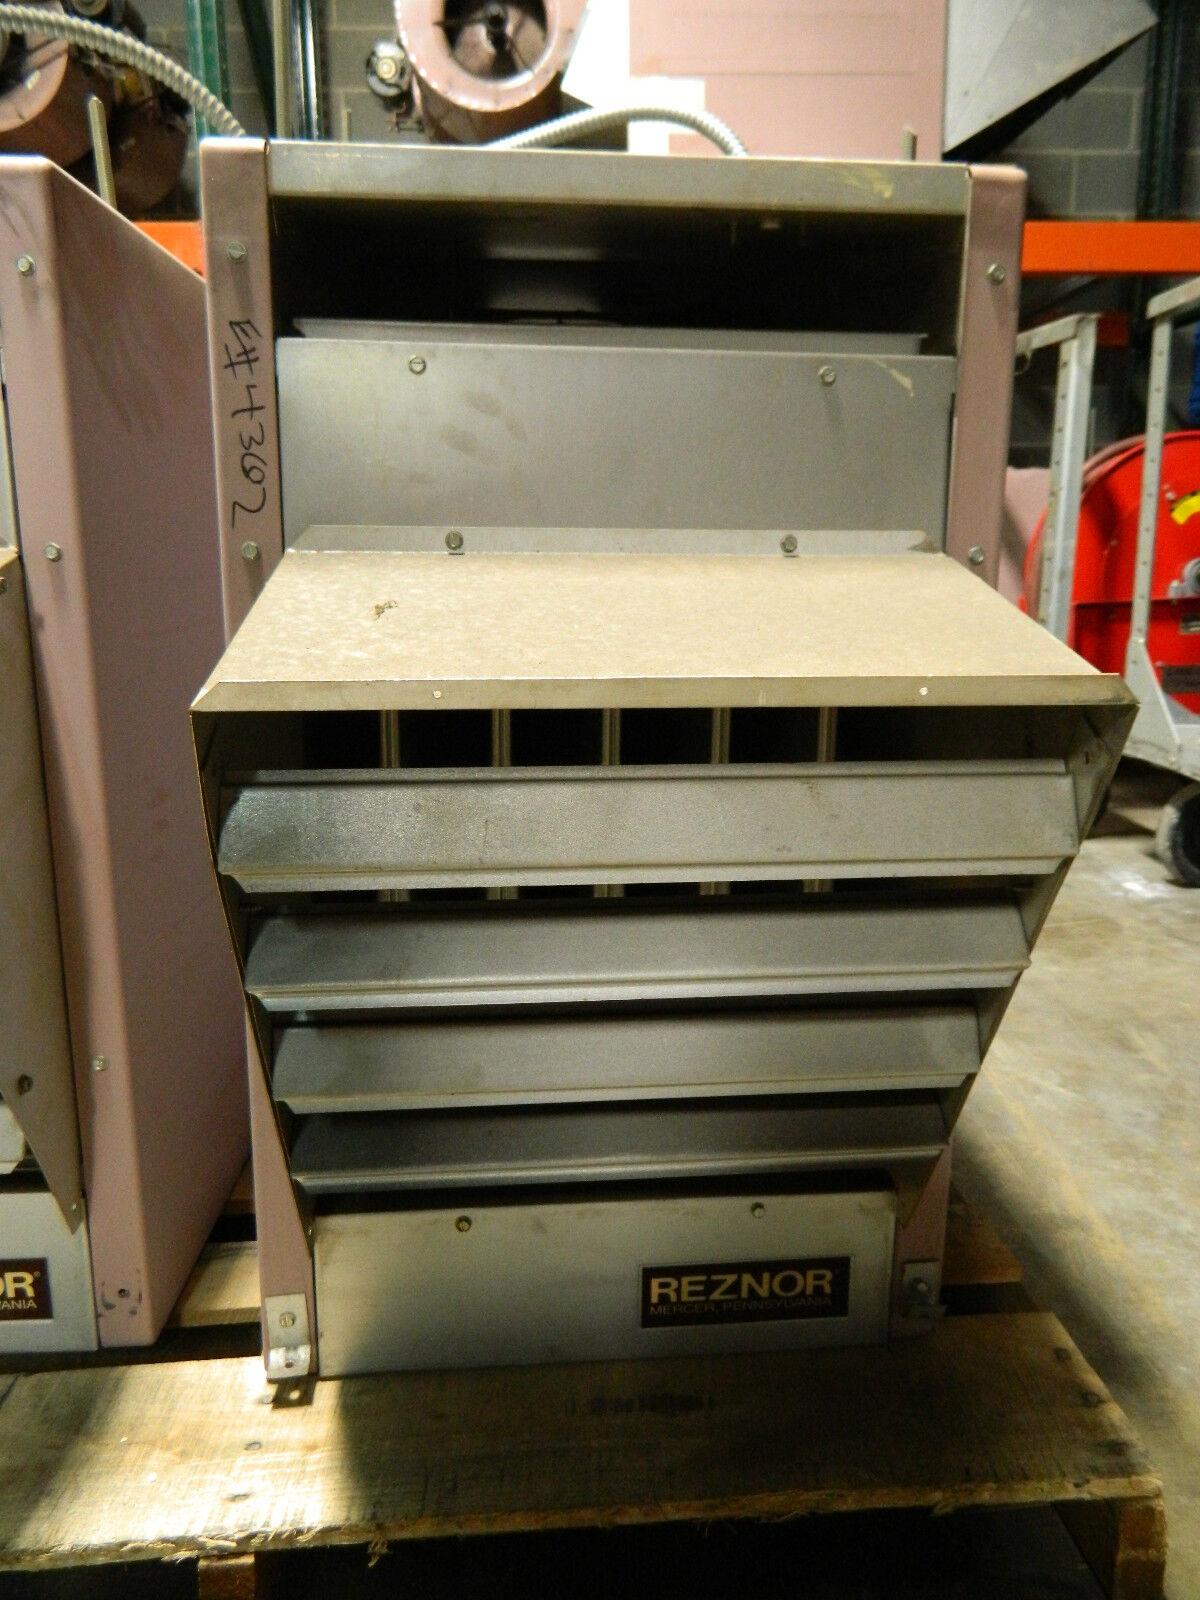 Reznor Heater Wiring 400 3 Quick Start Guide Of Diagram Gas Martek Electronic Ignition Suzuchi Gs750e U2022 Edmiracle Co